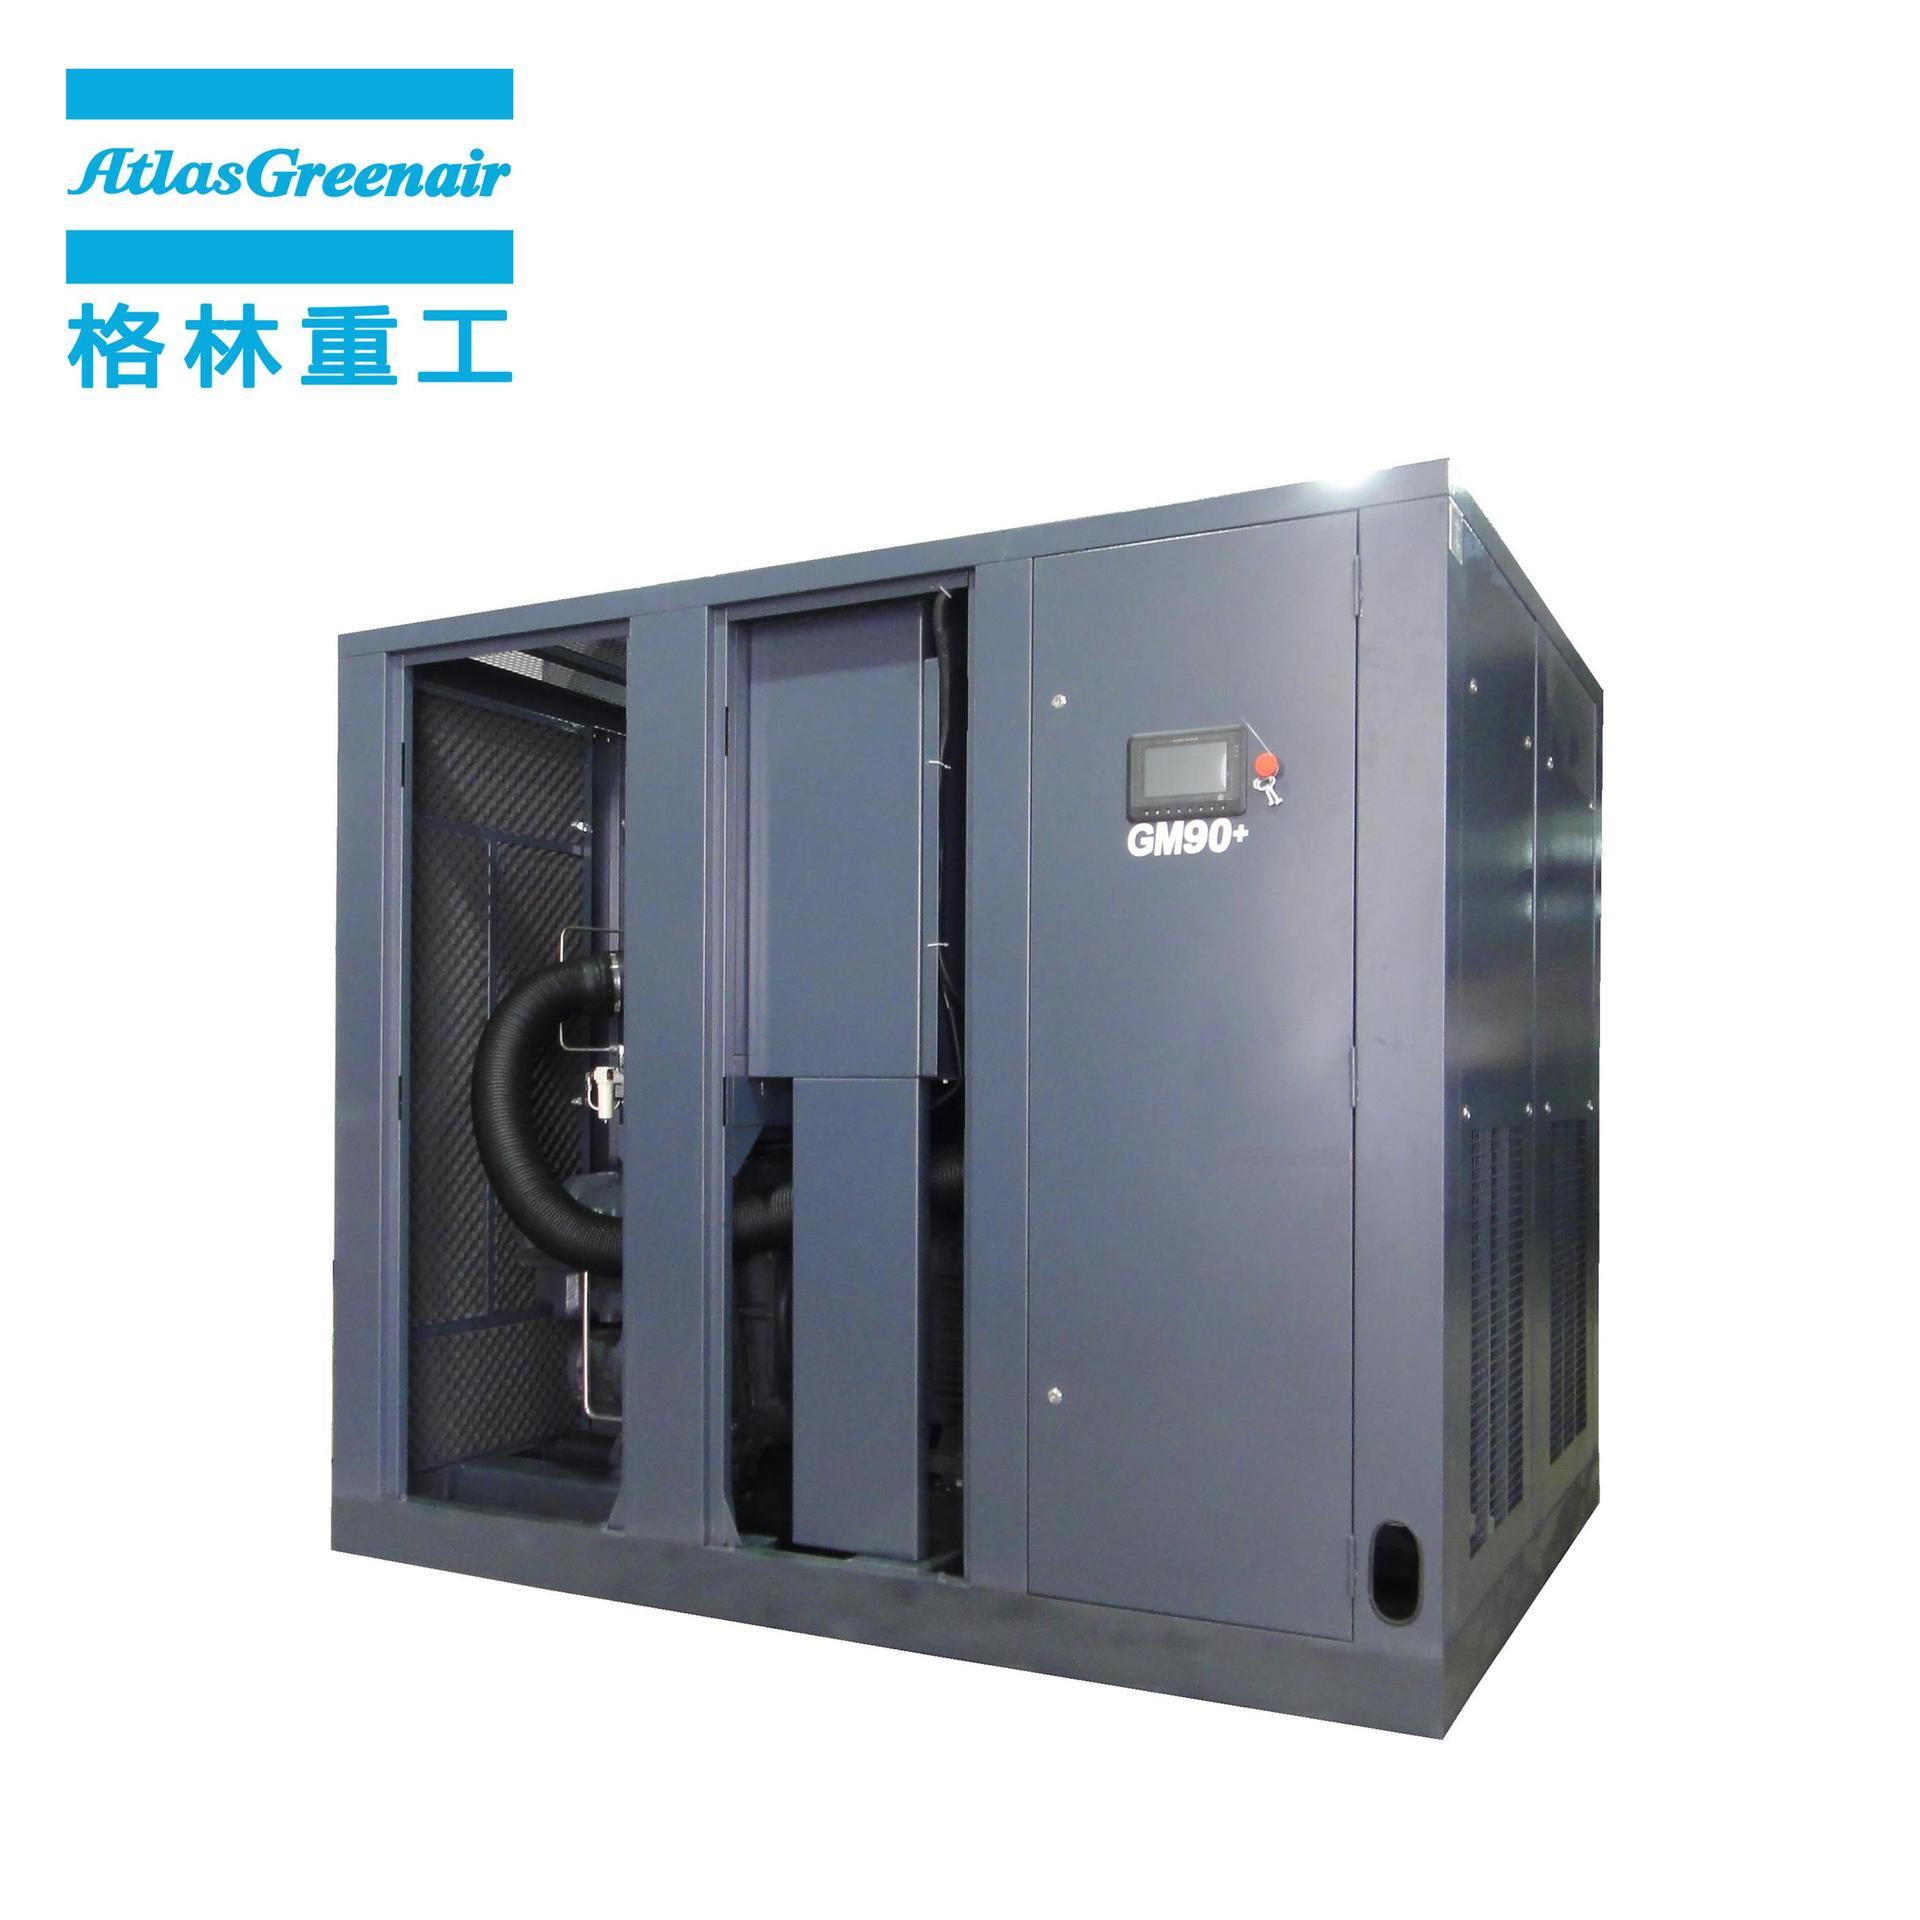 Atlas Greenair GM90+ 90kW Two Stage Permanent Magnet Motor Screw Air Compressor